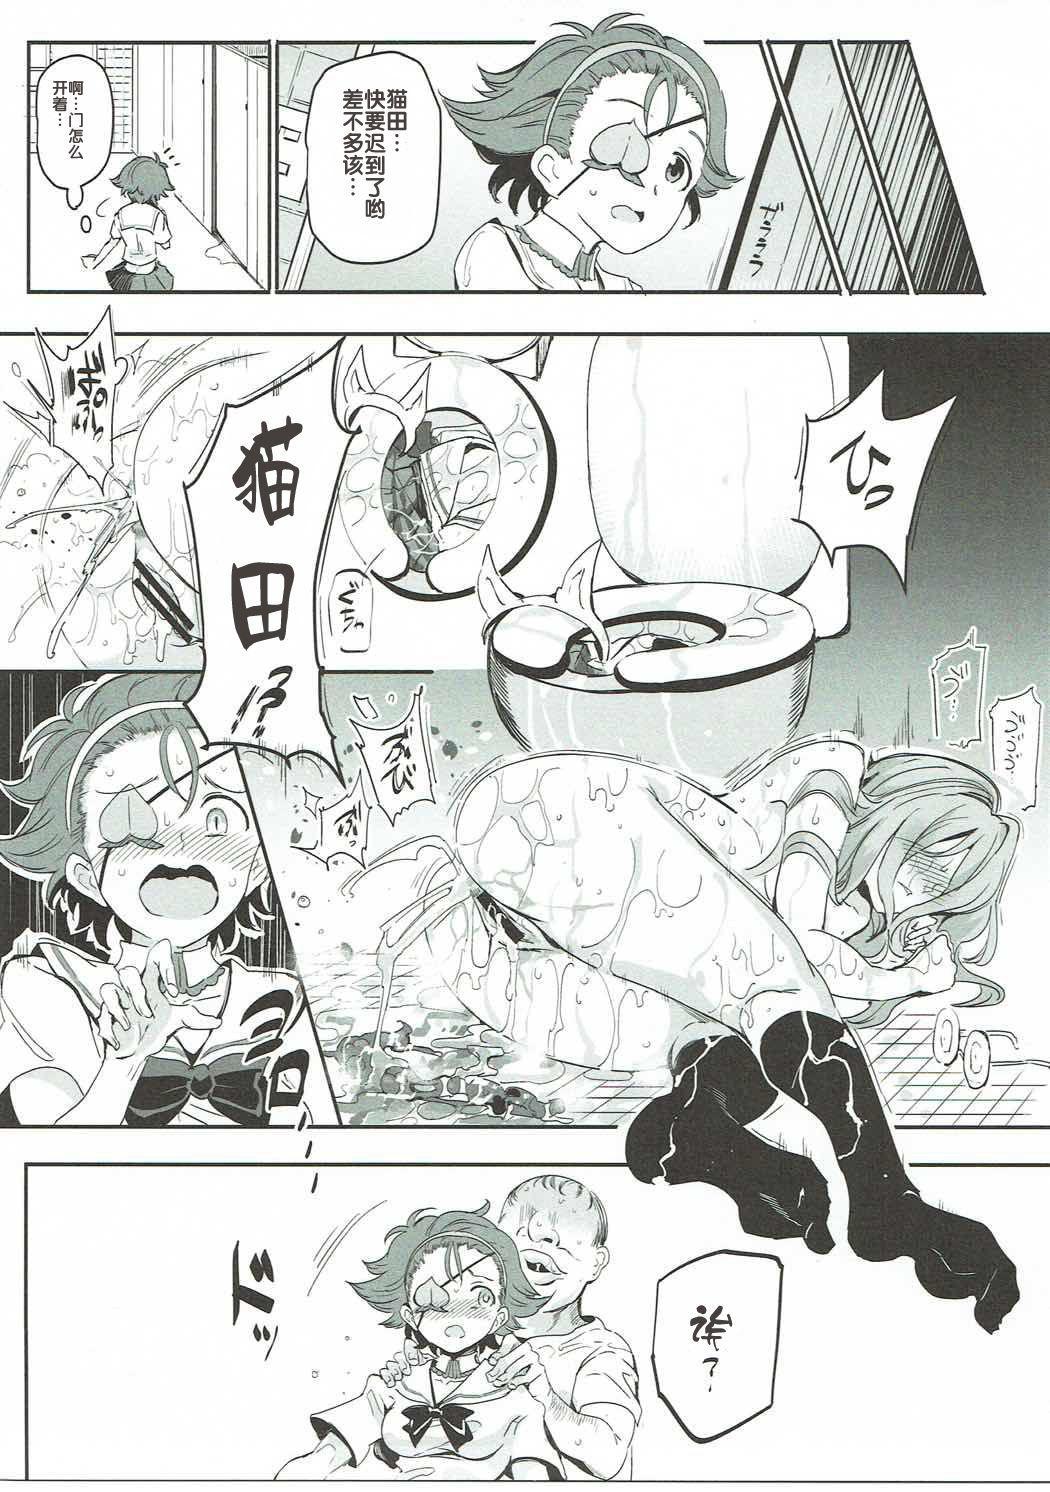 Girls & Kyousei Panpan 12